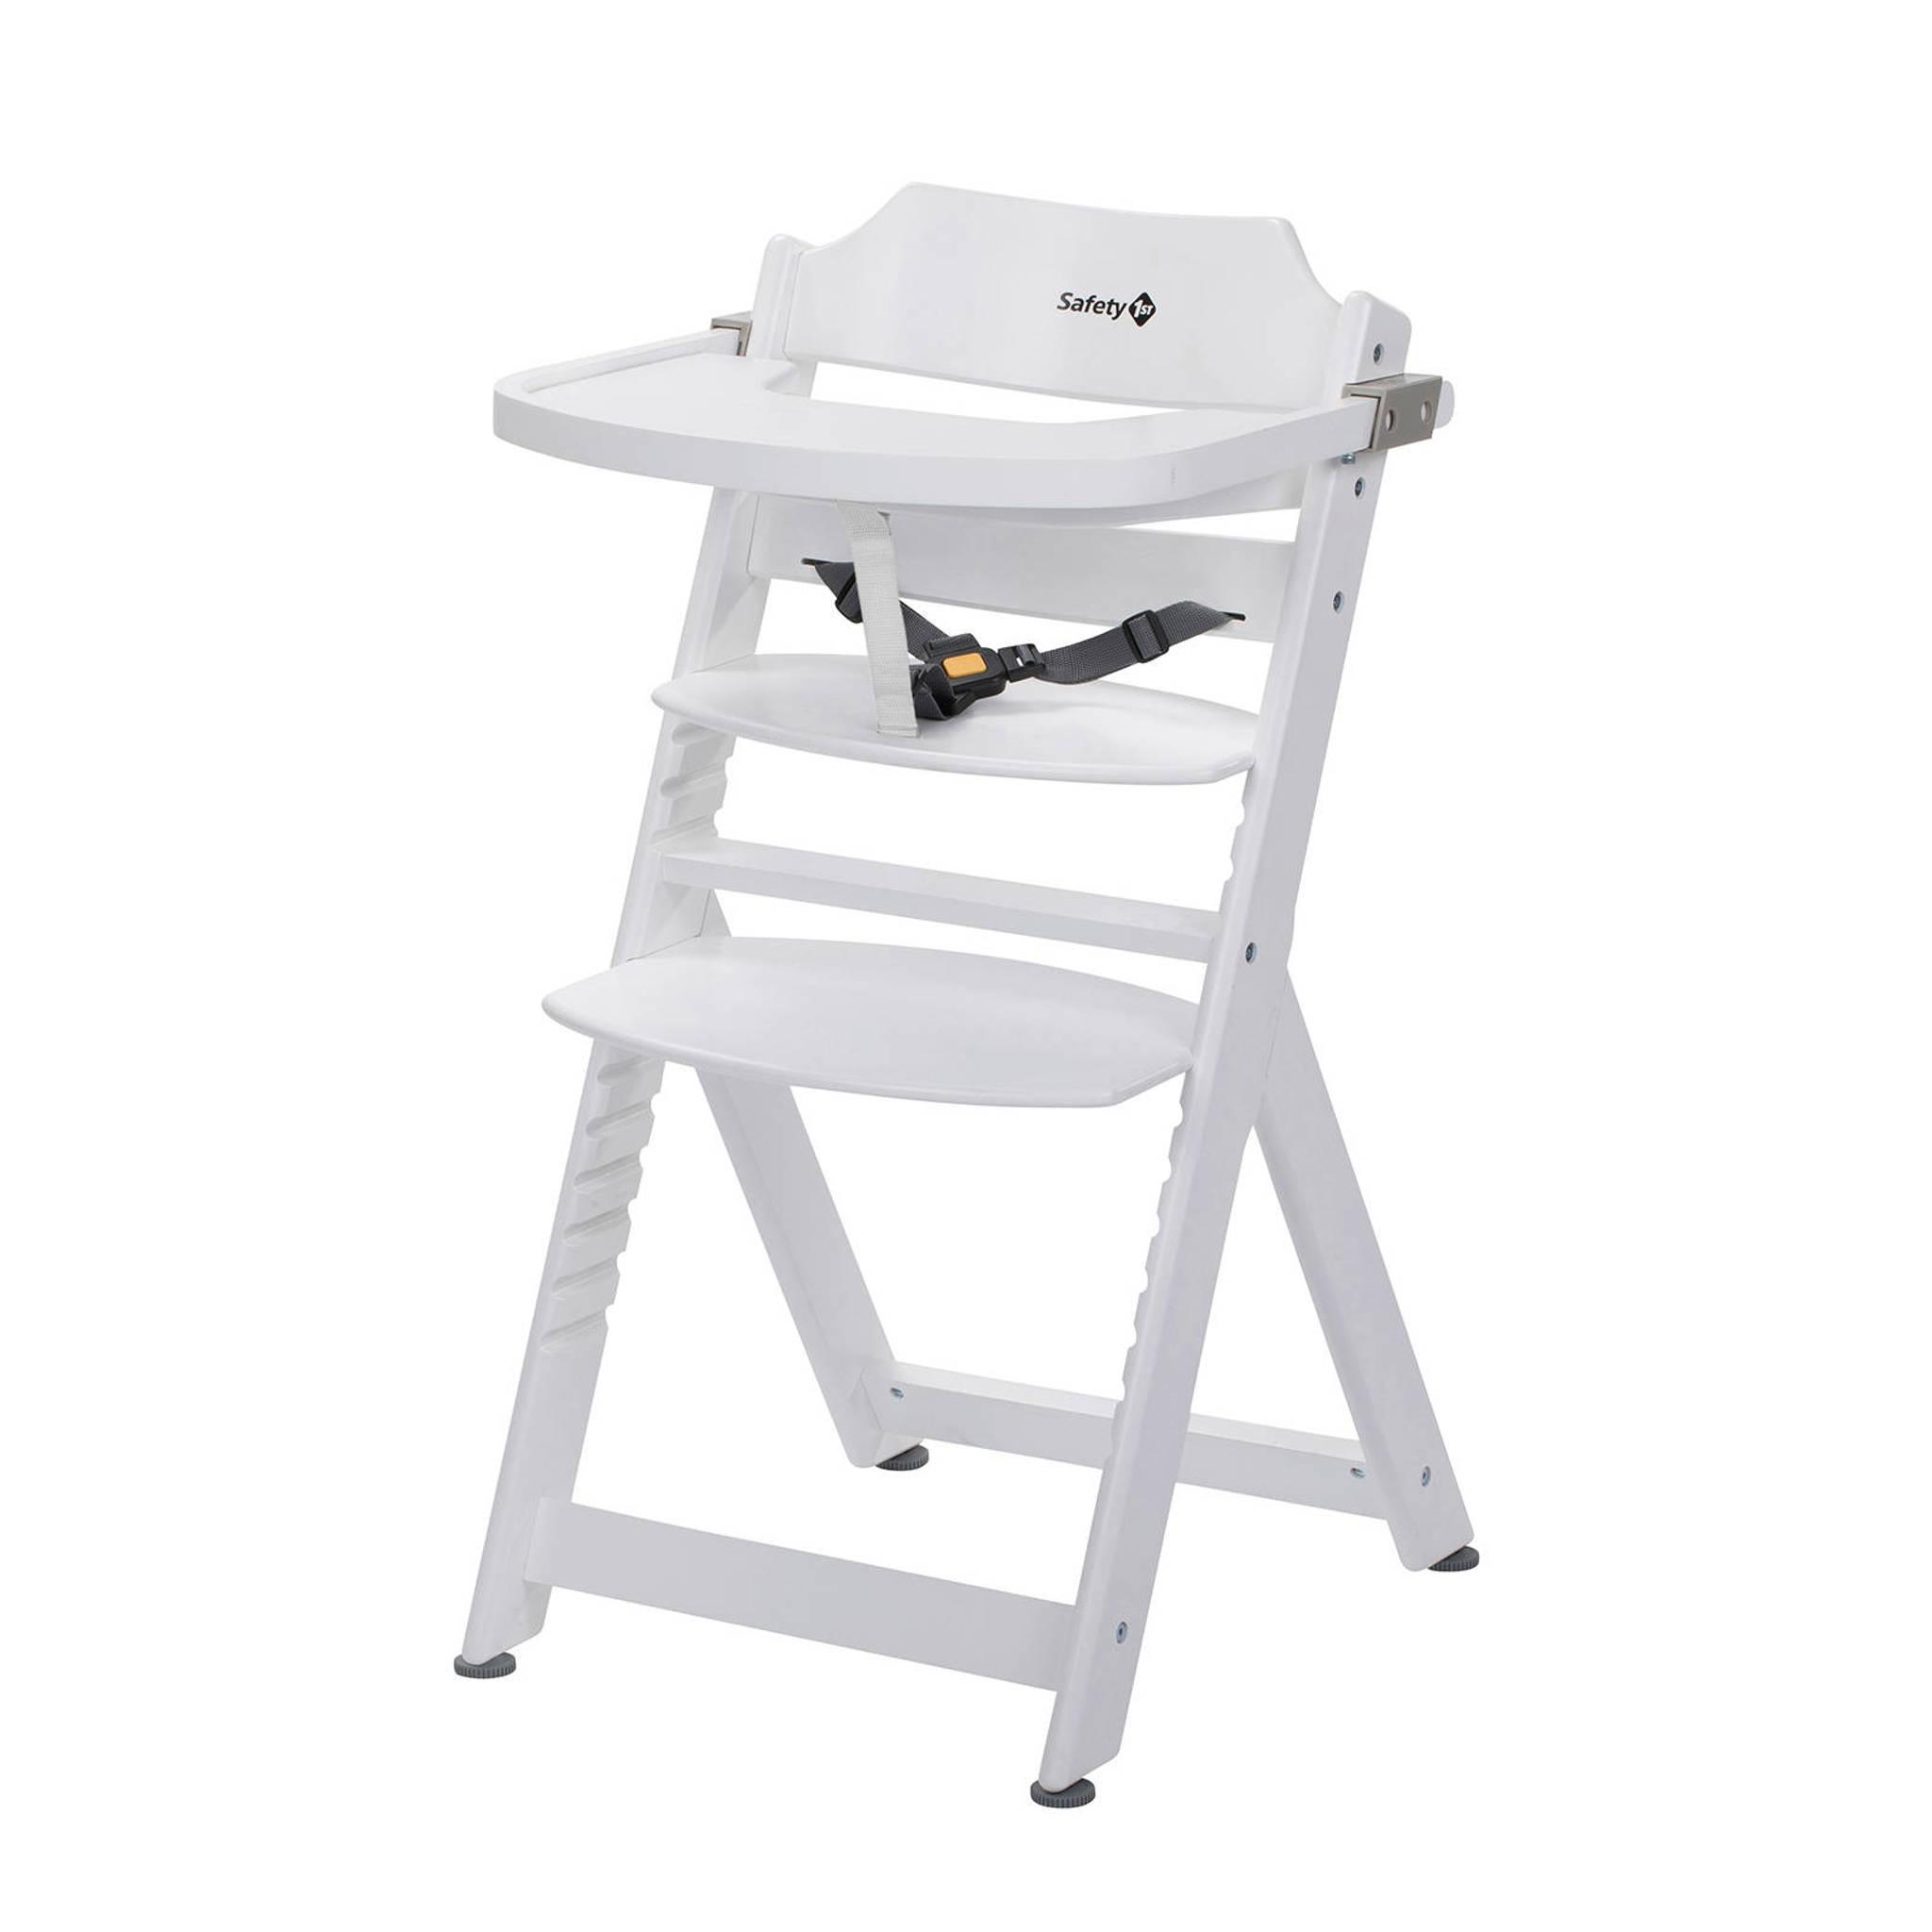 Houten Kinderstoel Wit.Safety 1st Timba Kinderstoel Wit Wehkamp